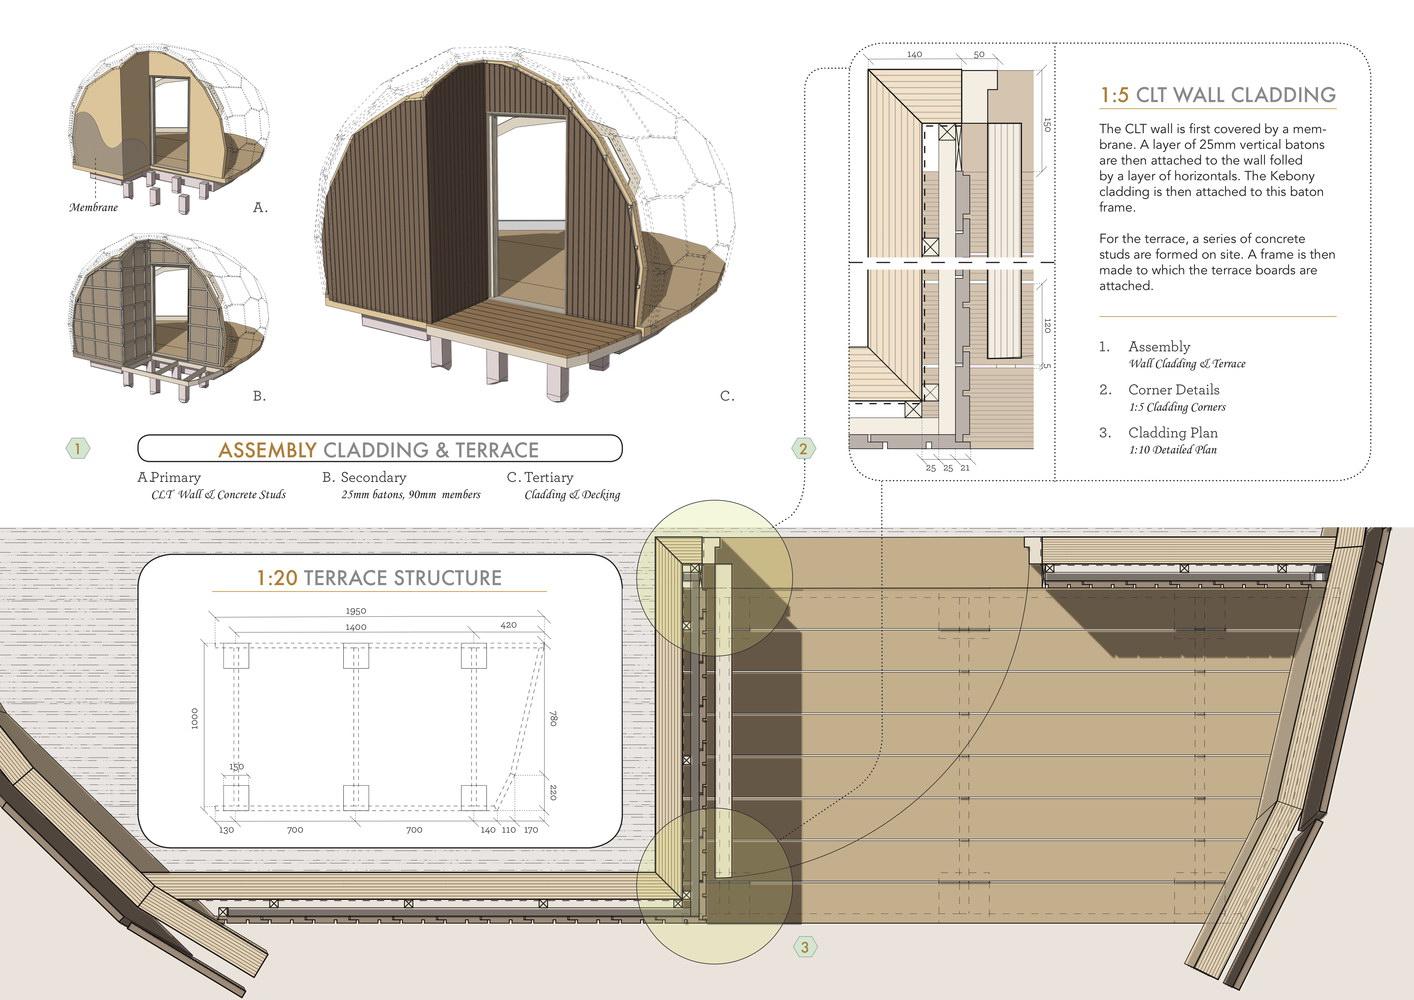 Hammerfest Hiking Cabins by SPINN ArkitekterHammerfest Hiking Cabins by SPINN Arkitekter